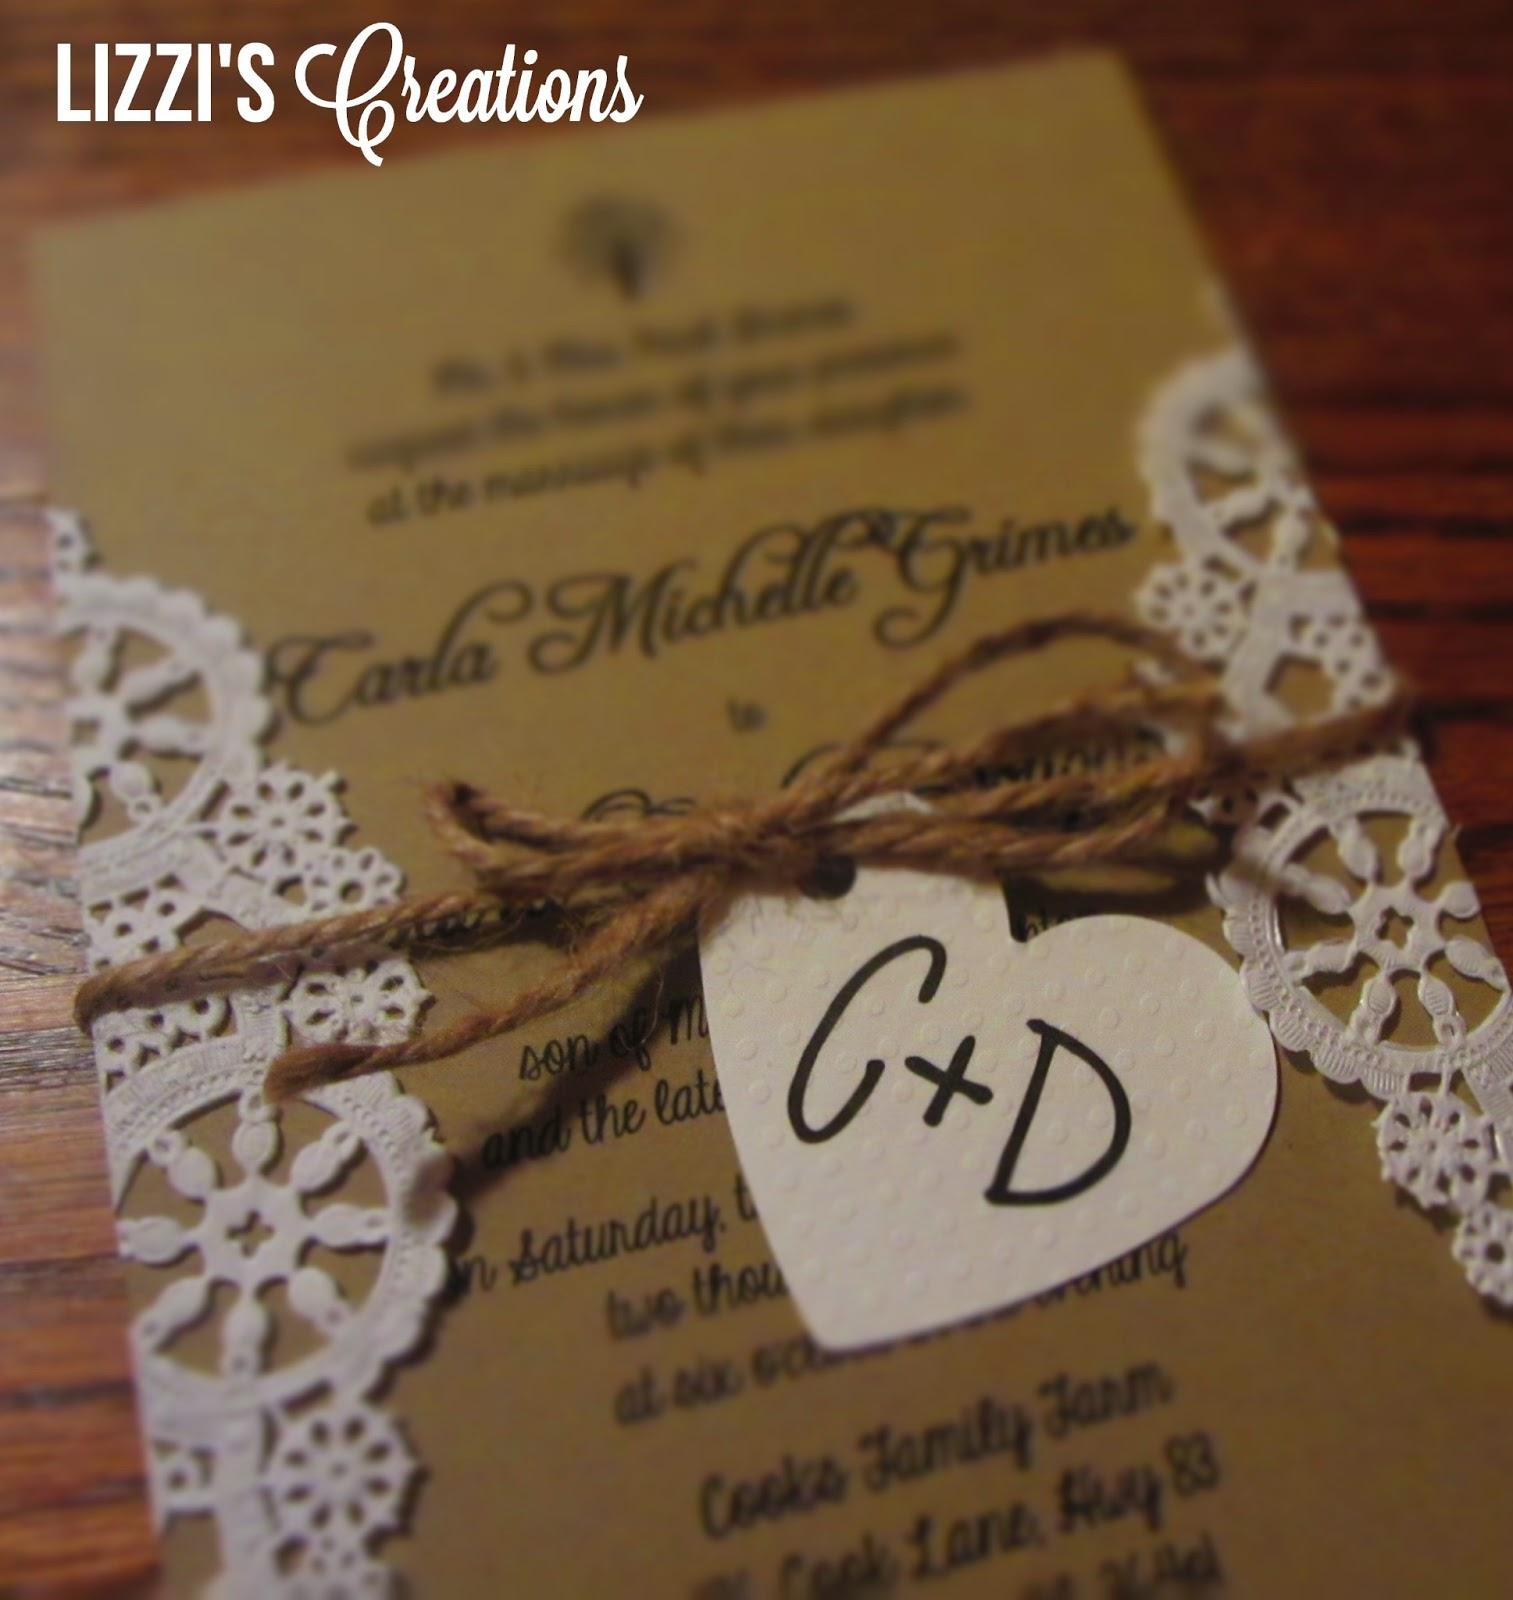 Rustic Wedding Invitations: Lizzi's Creations: Project Wedding: Invitations And Programs